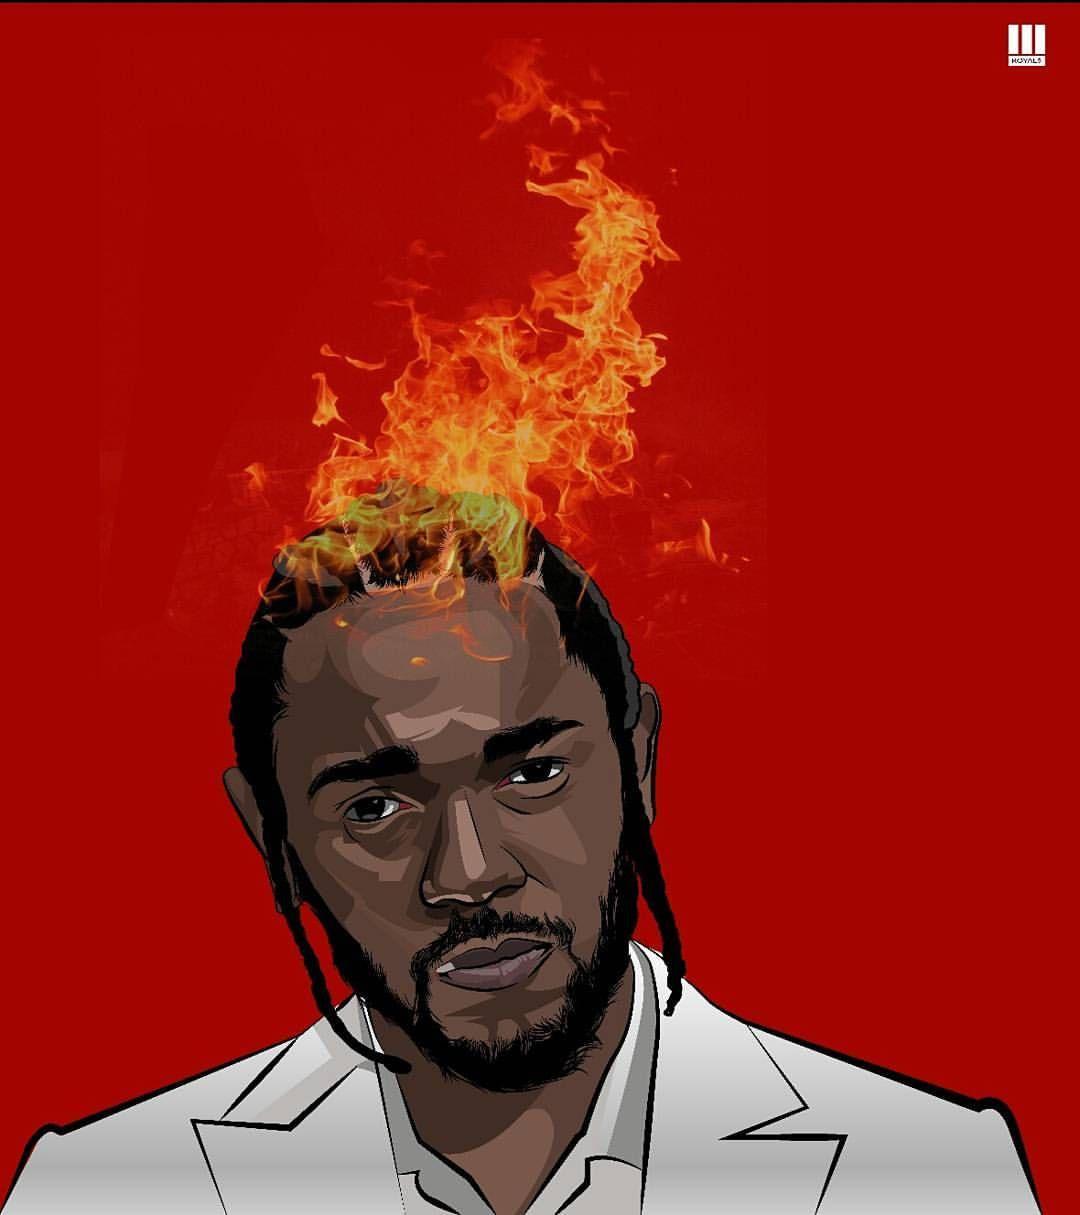 Kendrick lamar wallpaper iphone 6 - Kendrick Lamar Humble Tde Iv Myleftstrokejustwentviral Kendricklamar